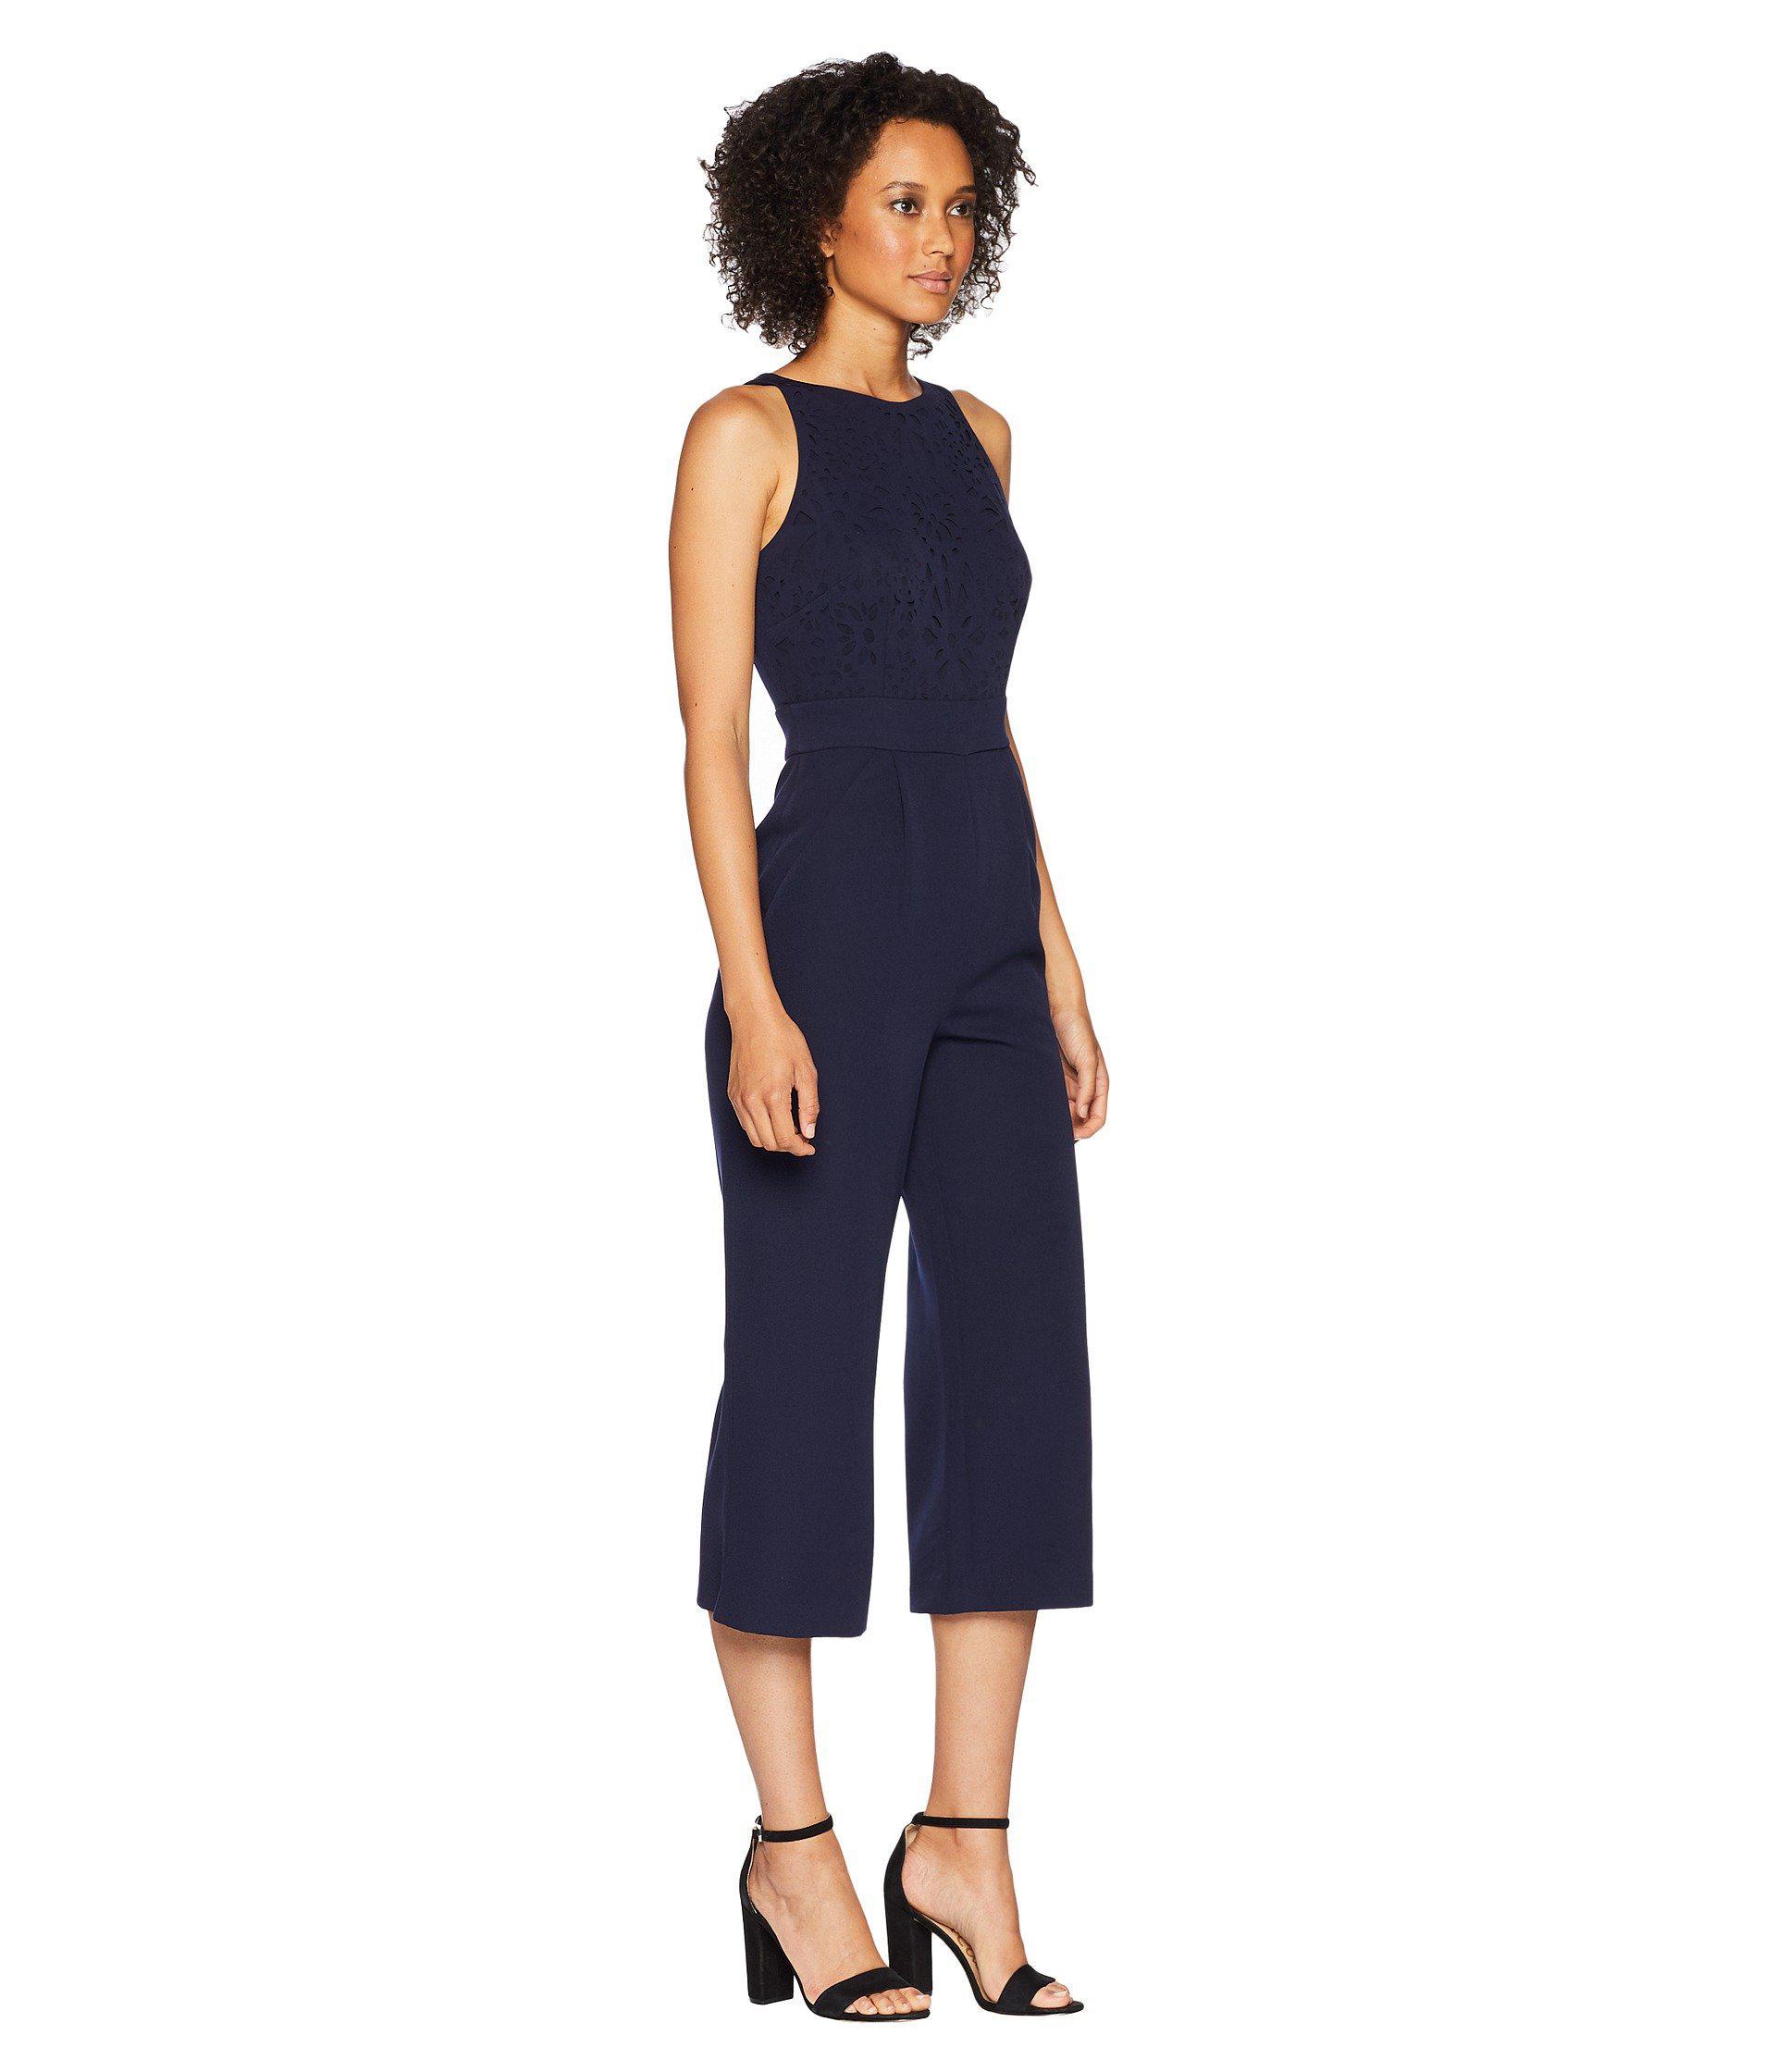 55052c71357b Tahari - Blue Lasercut Jumpsuit - Lyst. View fullscreen